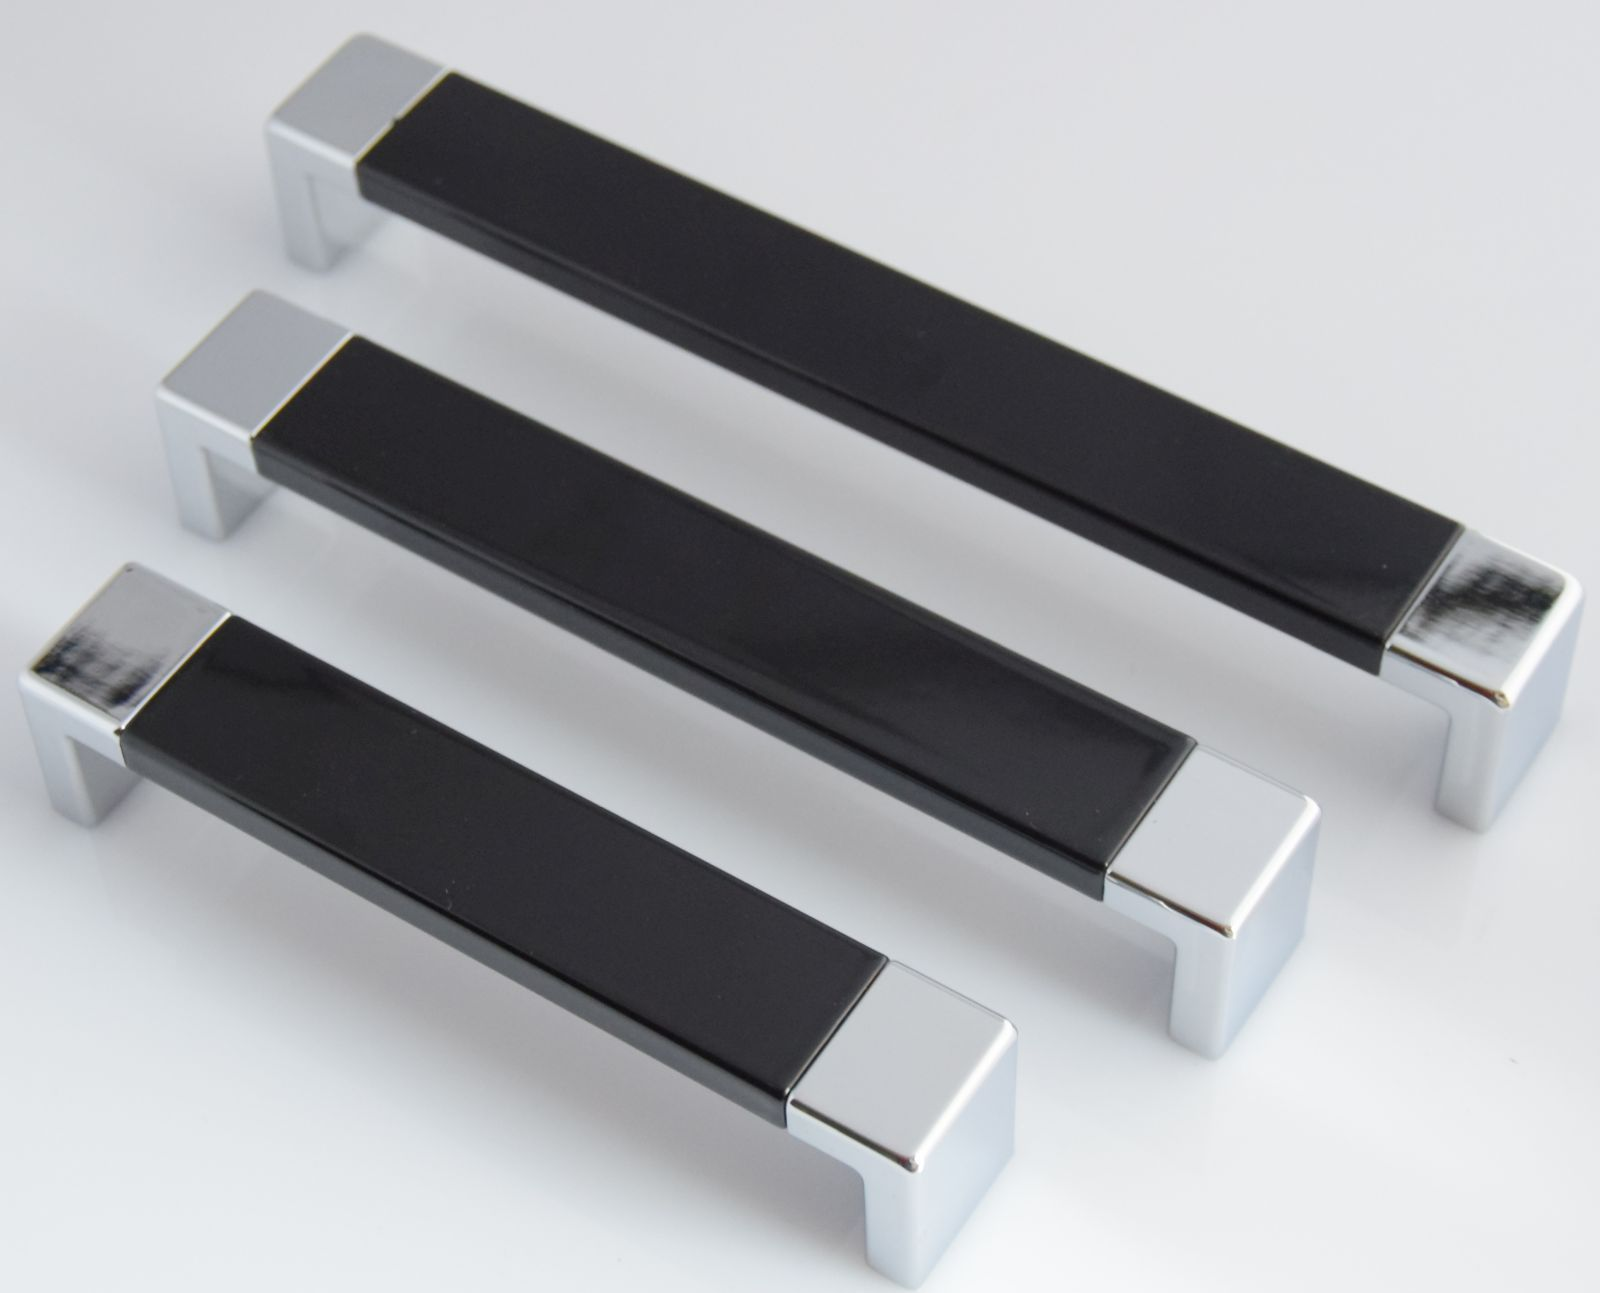 Schrankgriffe ba 128 192 mm t r m belgriffe griffe k che for Schubladengriffe metall